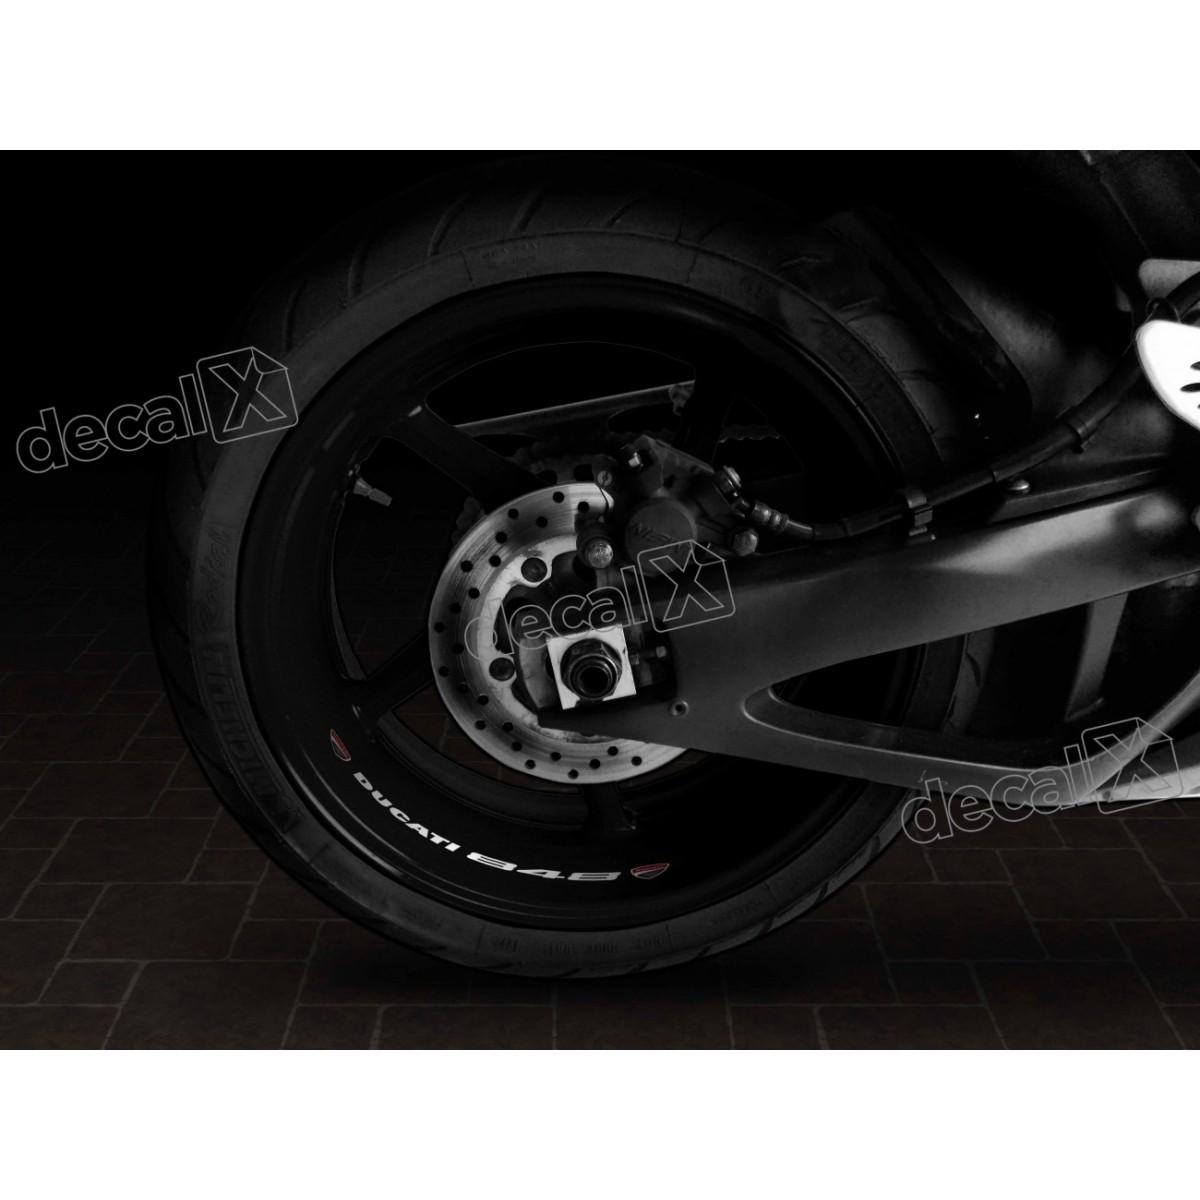 Adesivos Centro Roda Refletivo Moto Ducati 848 Rd6 - Decalx